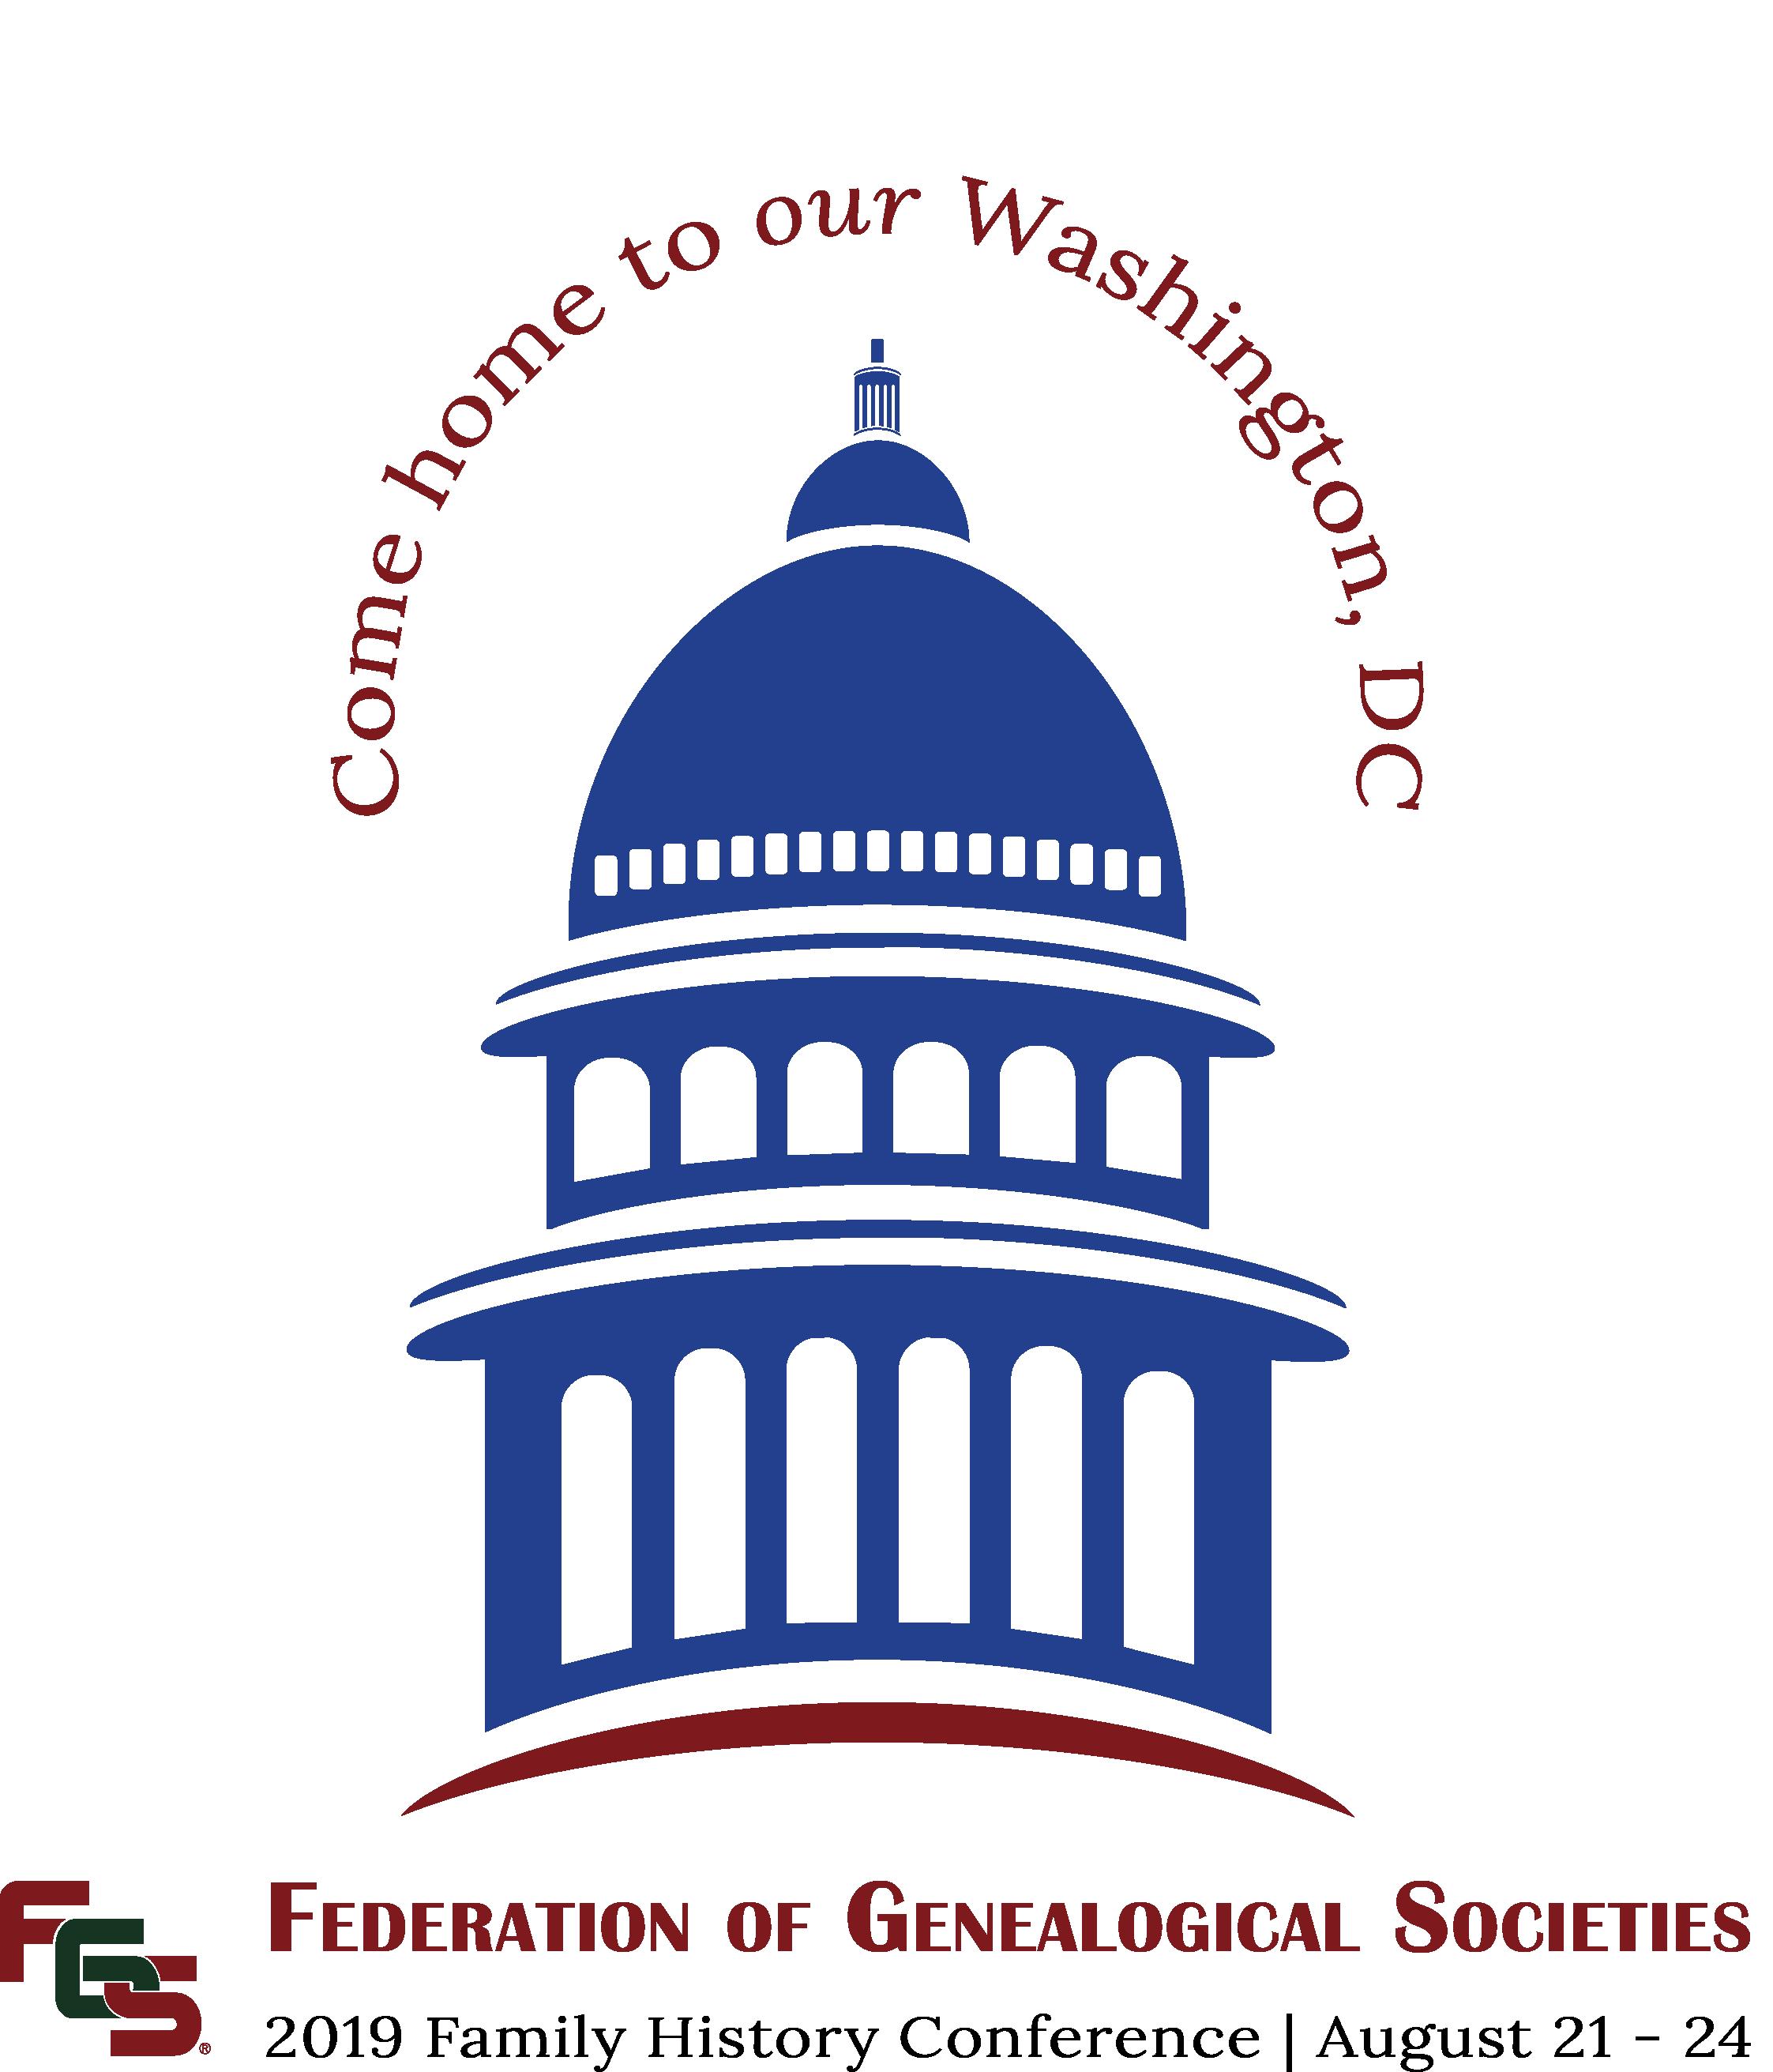 FGS 2019 Conference Logo